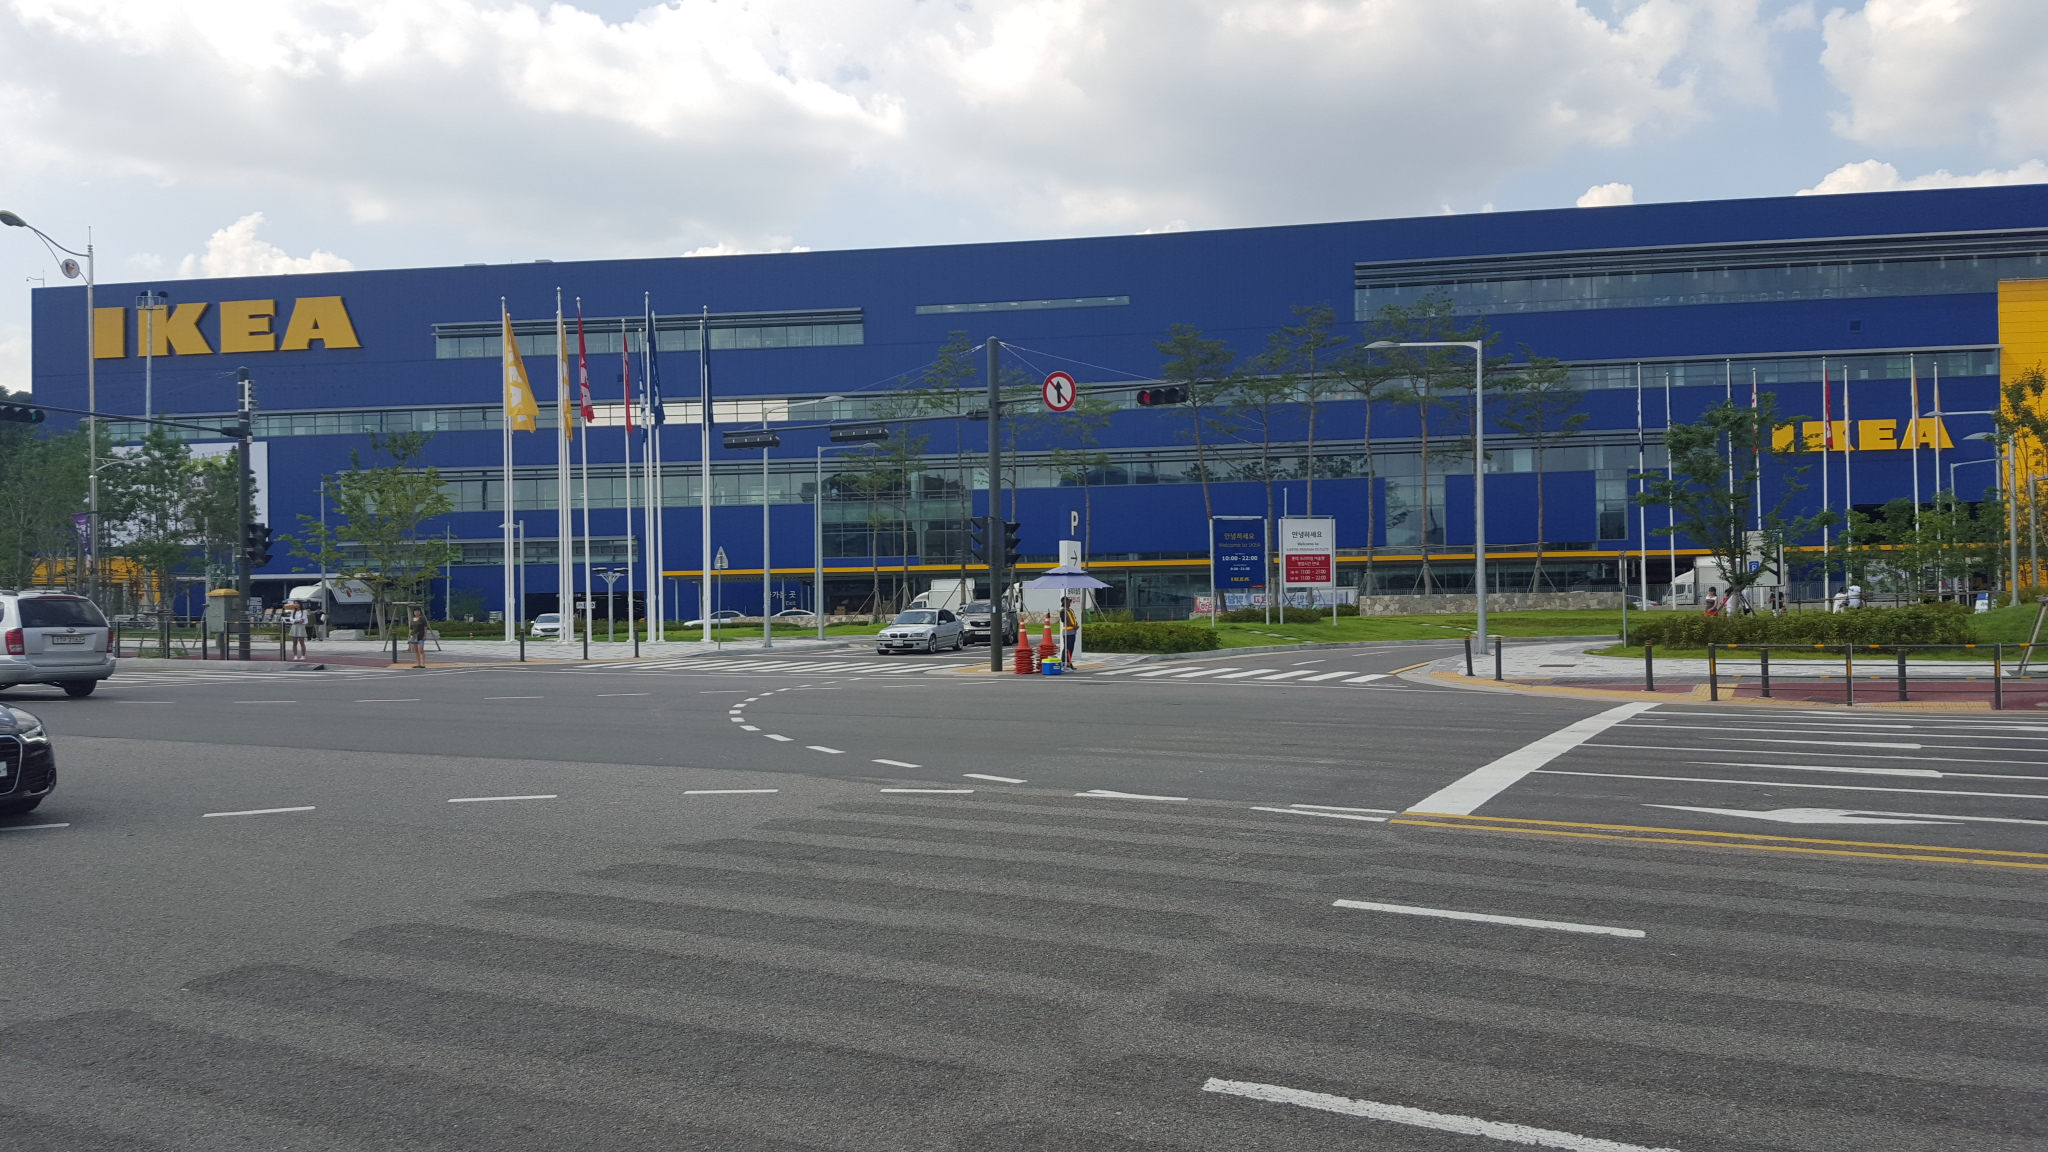 IKEAcom  International homepage